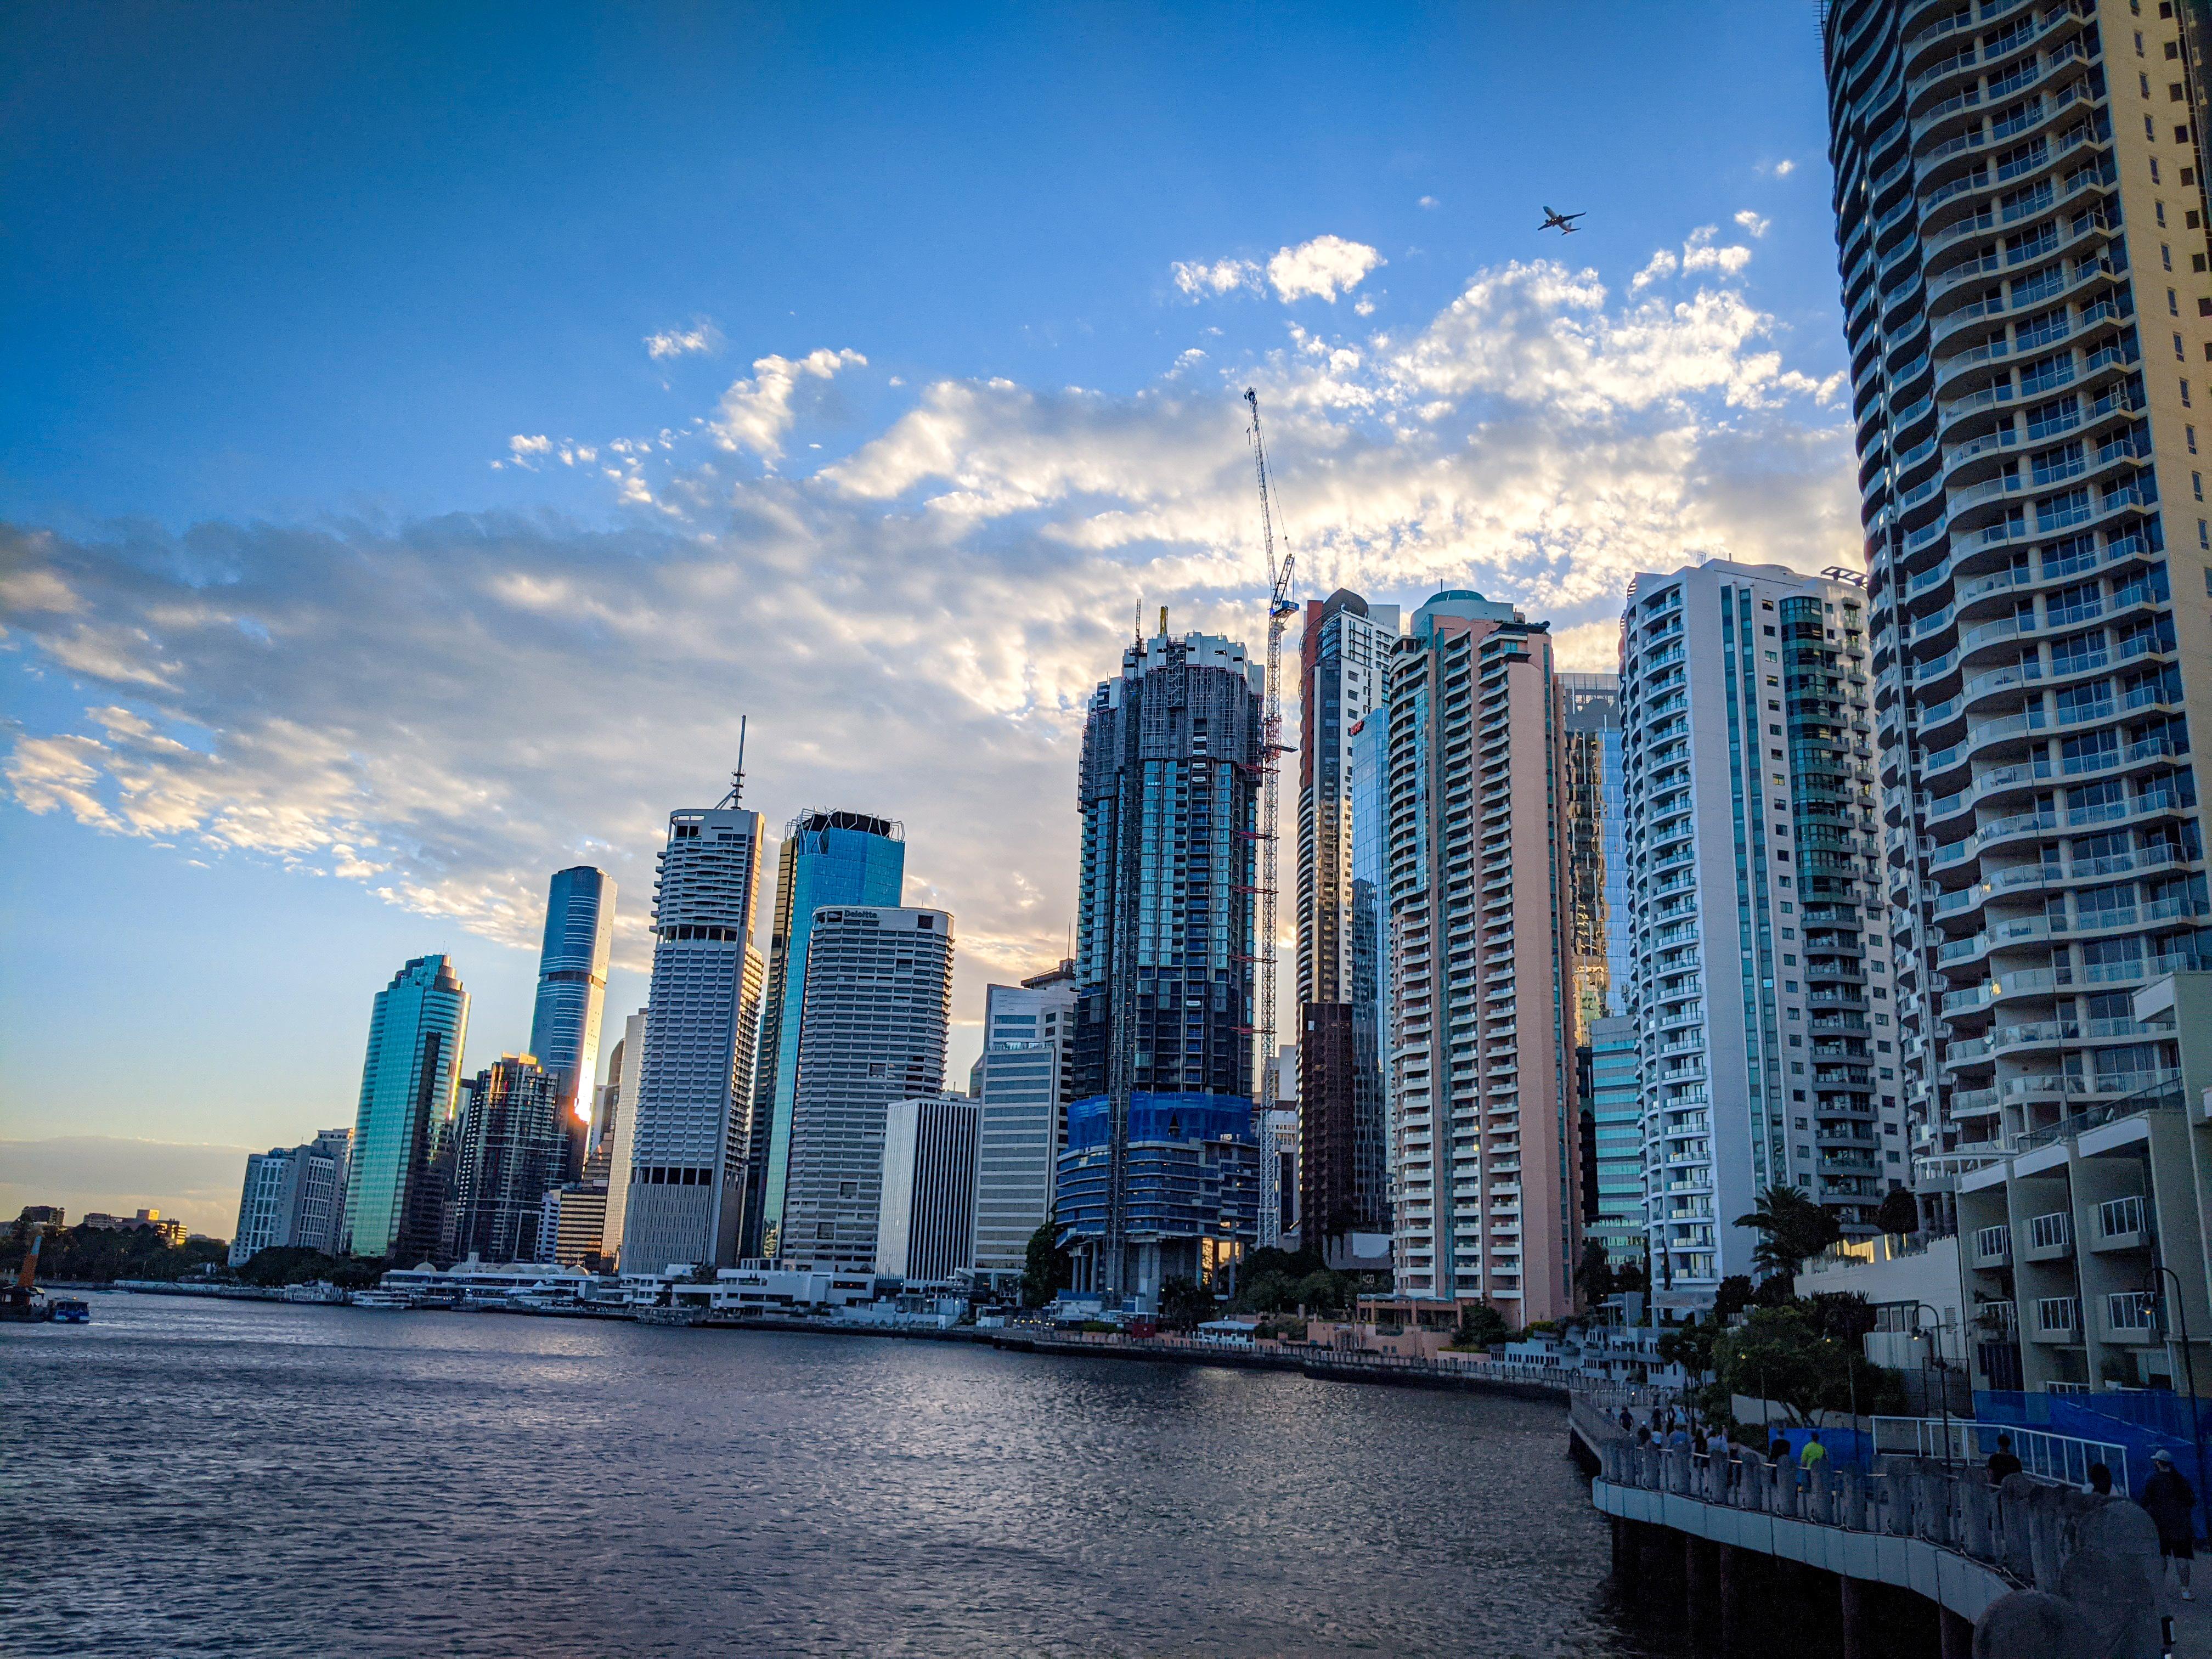 The Brisbane CBD and Brisbane River from the top of the Brisbane Riverwalk